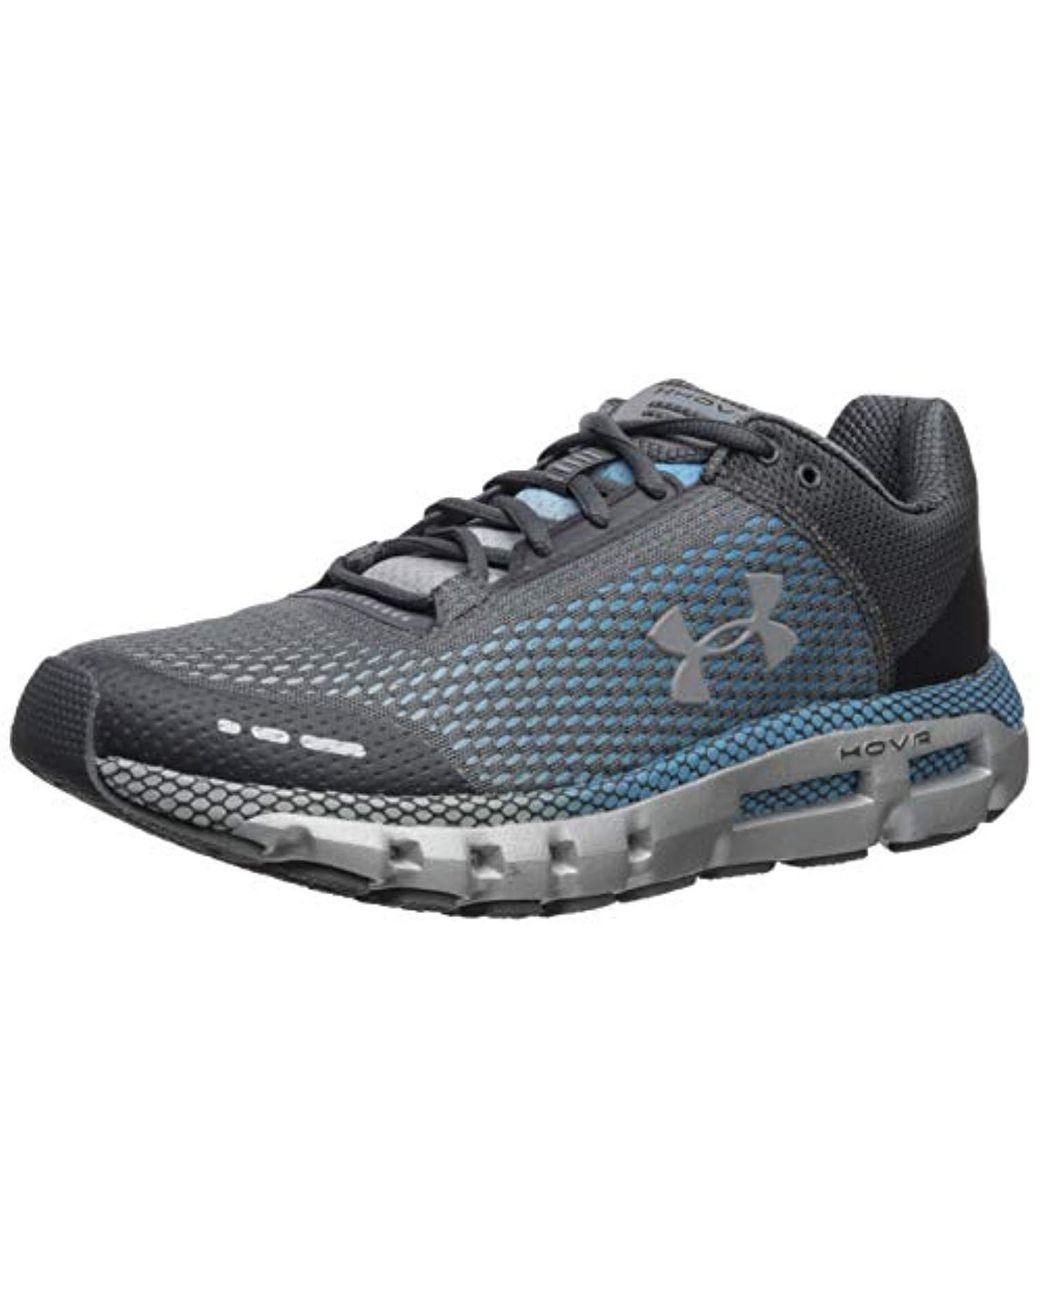 3b4048beca8 Under Armour Hovr Infinite Running Shoe in Blue for Men - Lyst